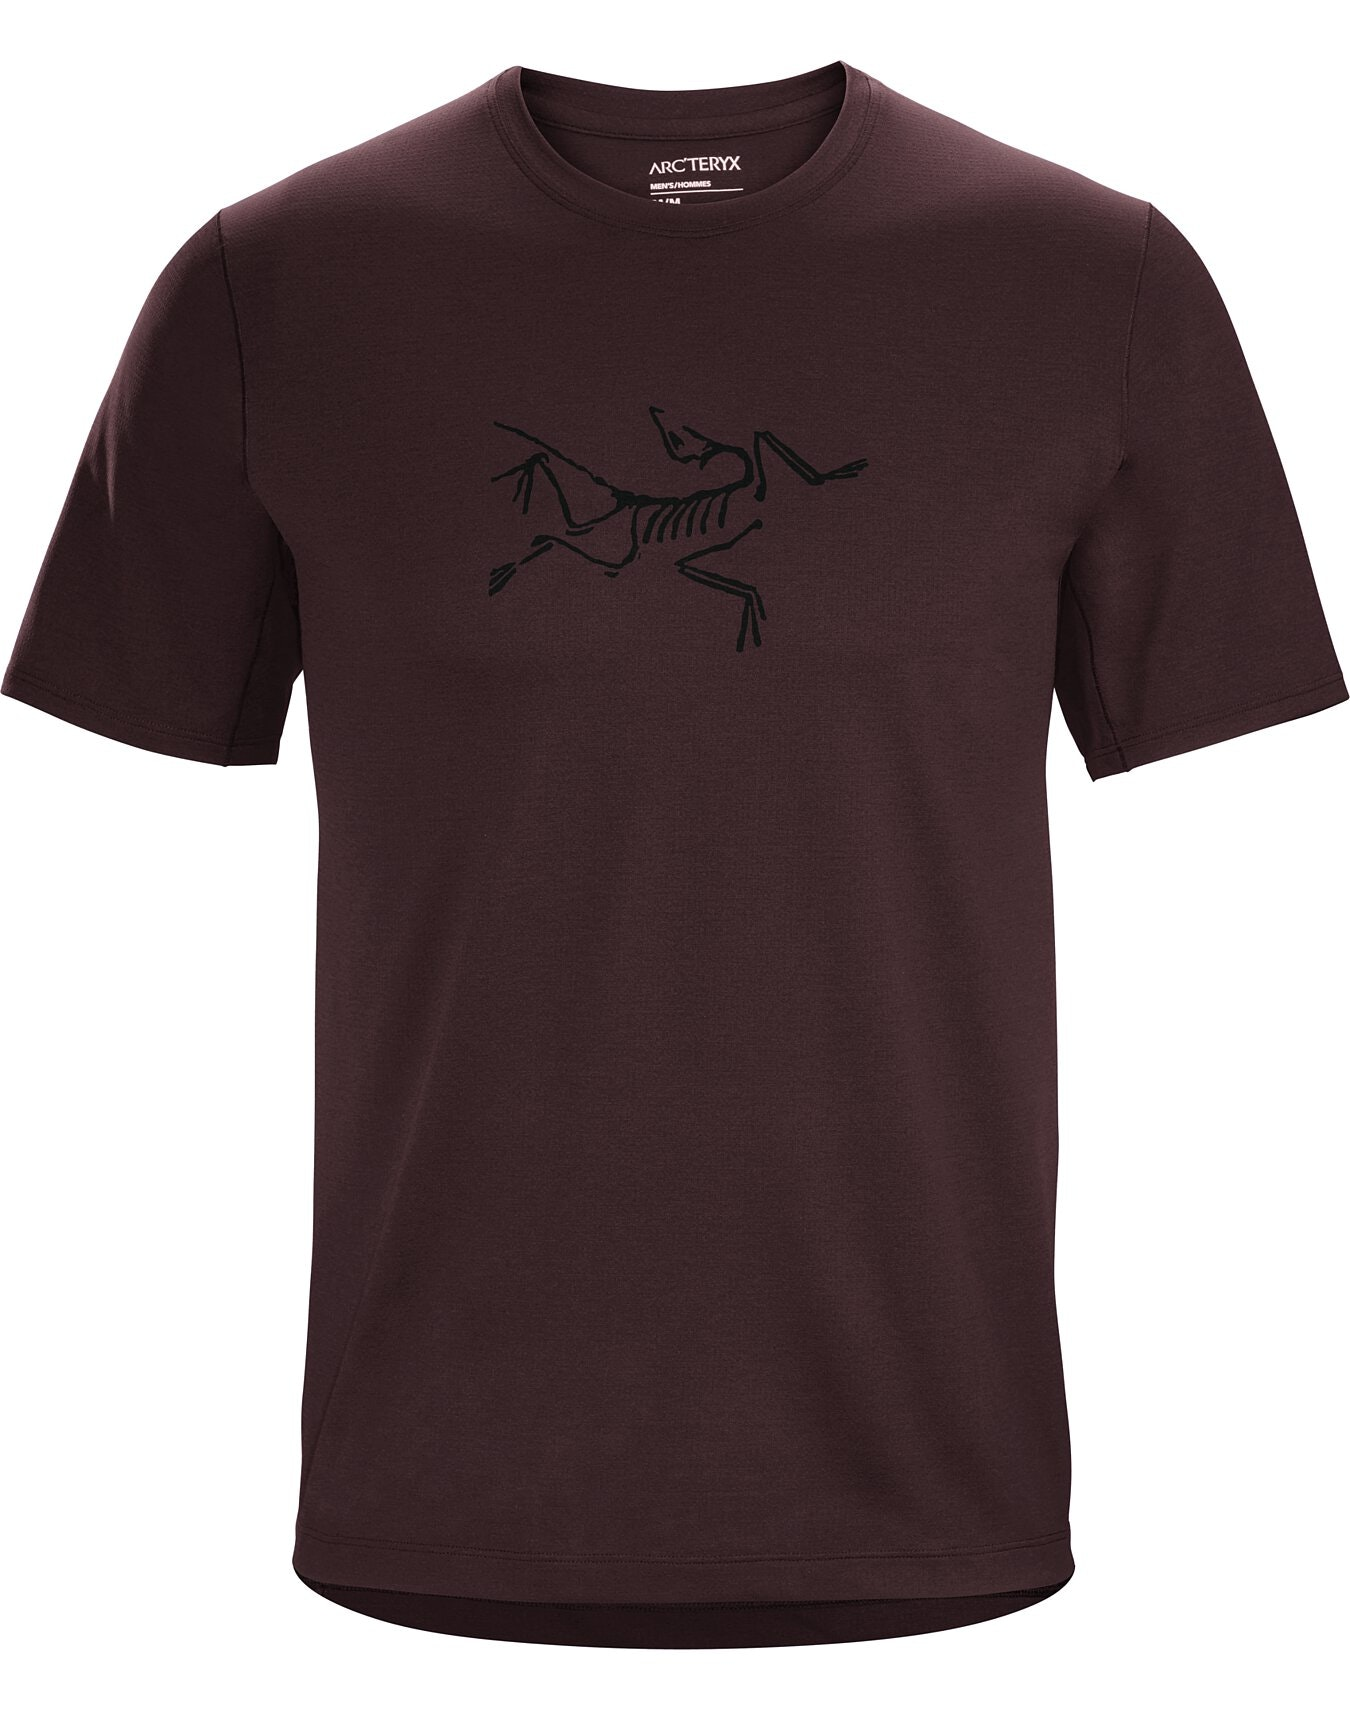 Cormac Logo Shirt SS Phantasm